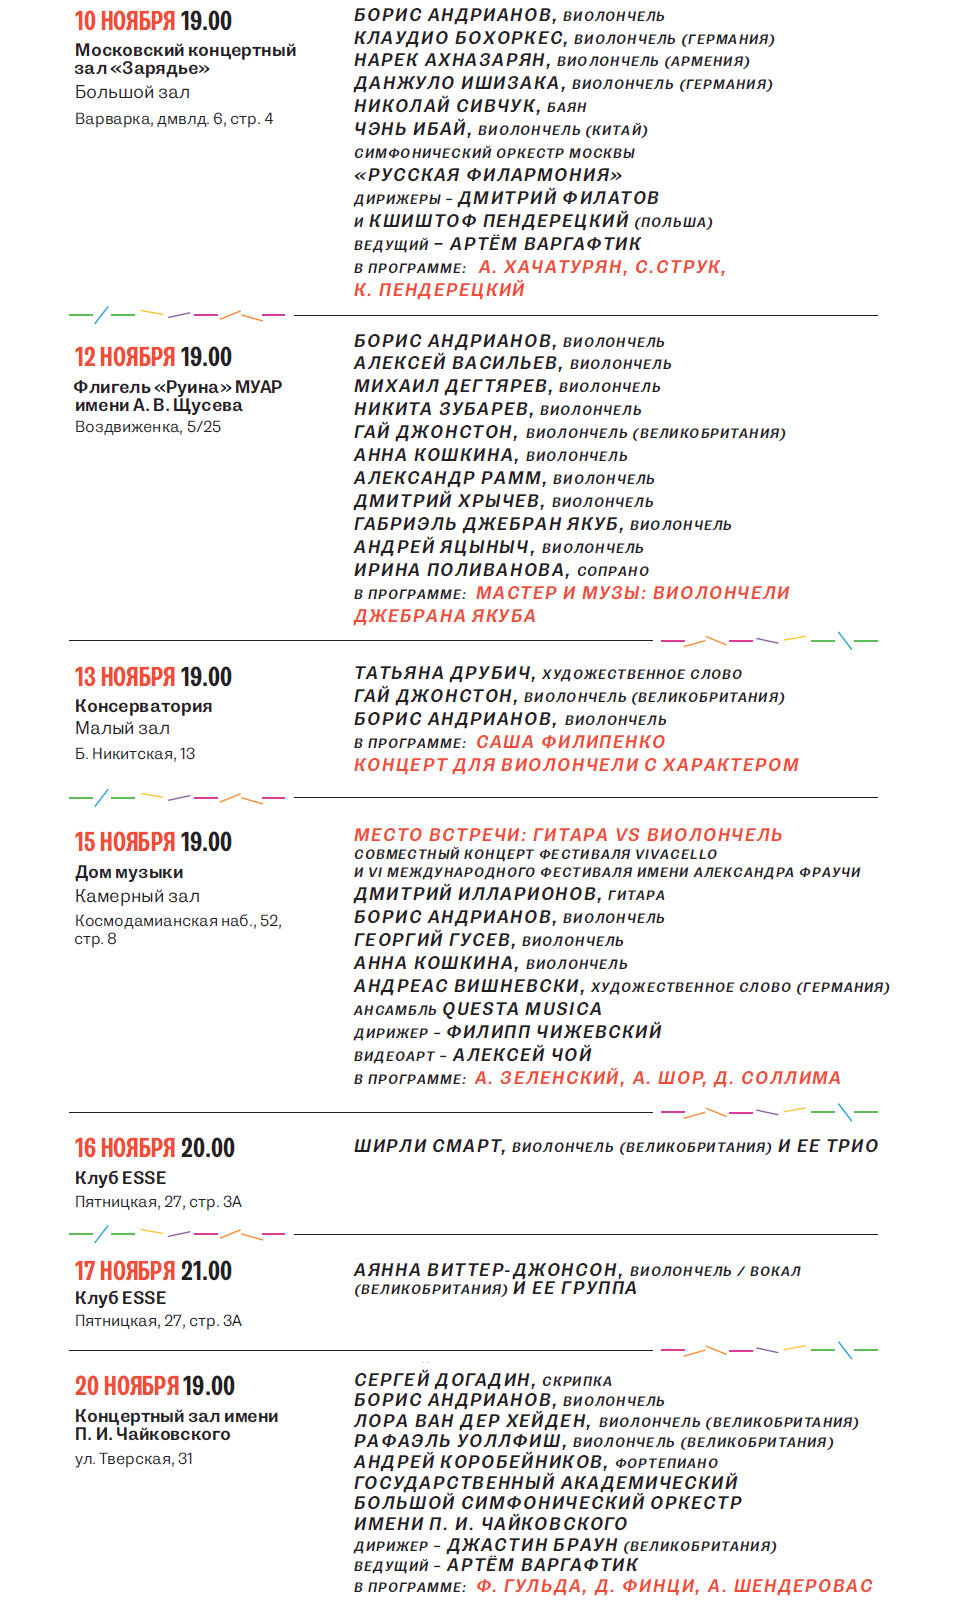 Vivacello-11_2019_rus.jpg